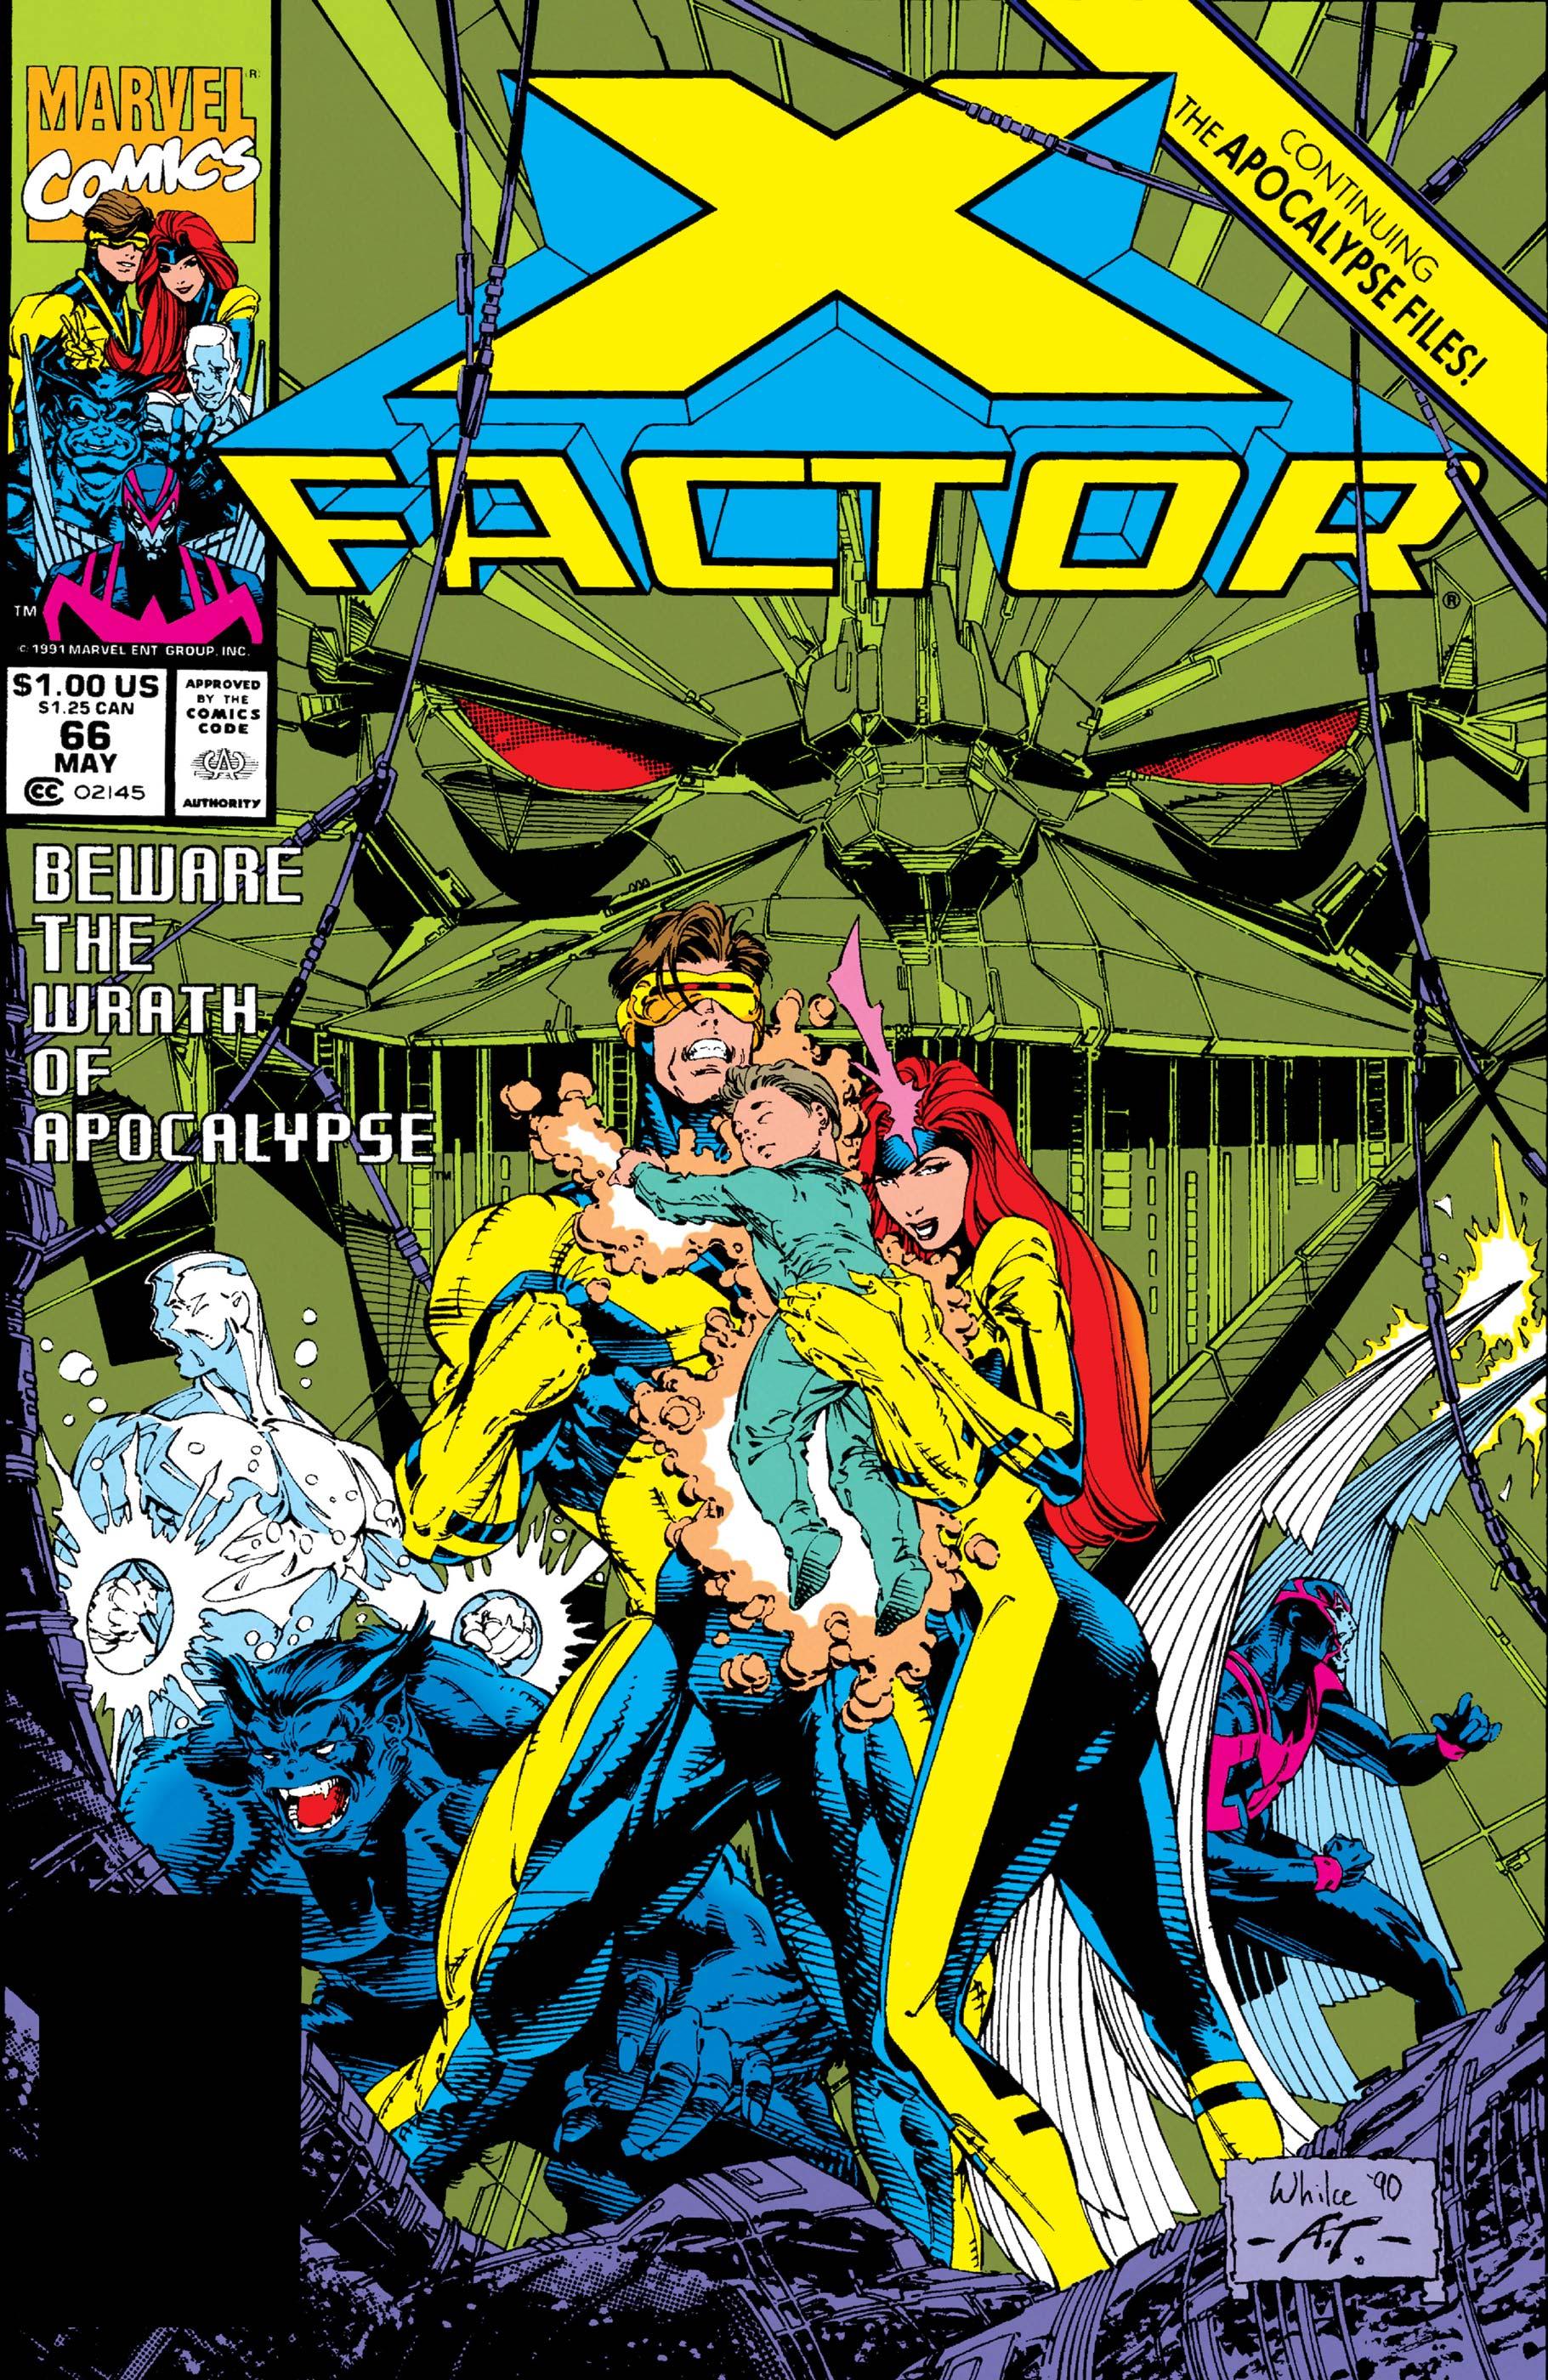 X-Factor (1986) #66